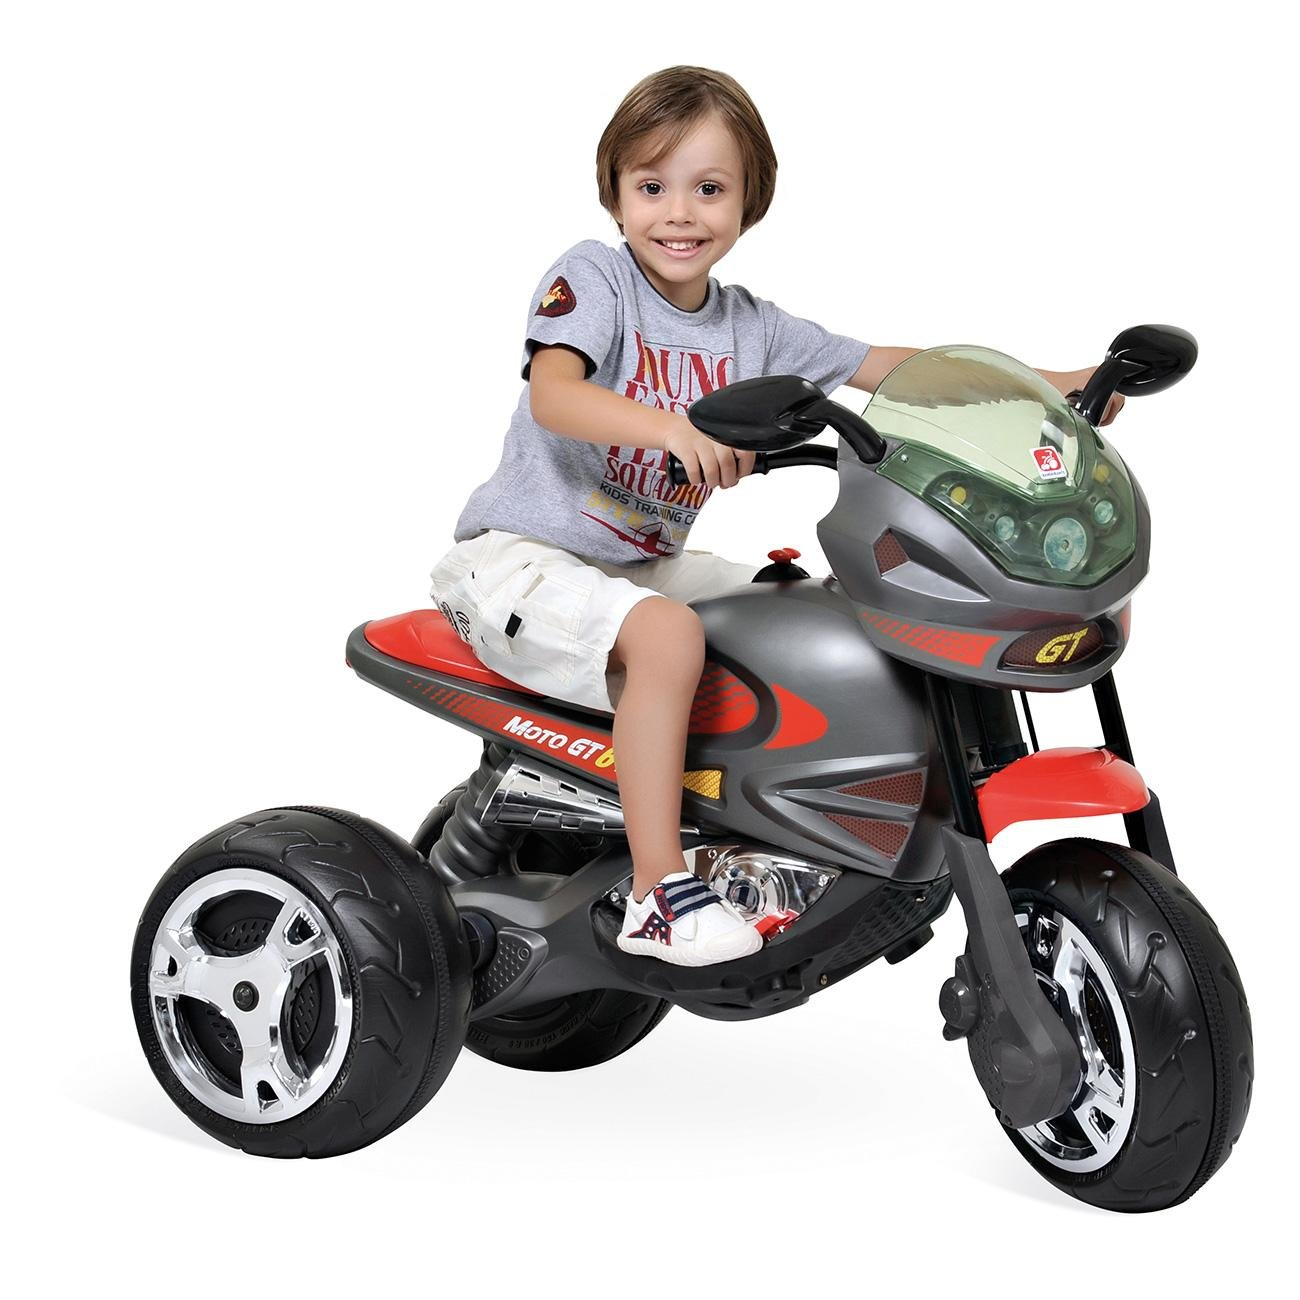 Moto Elétrica Super Moto Gp 6v Grafitte Bandeirante